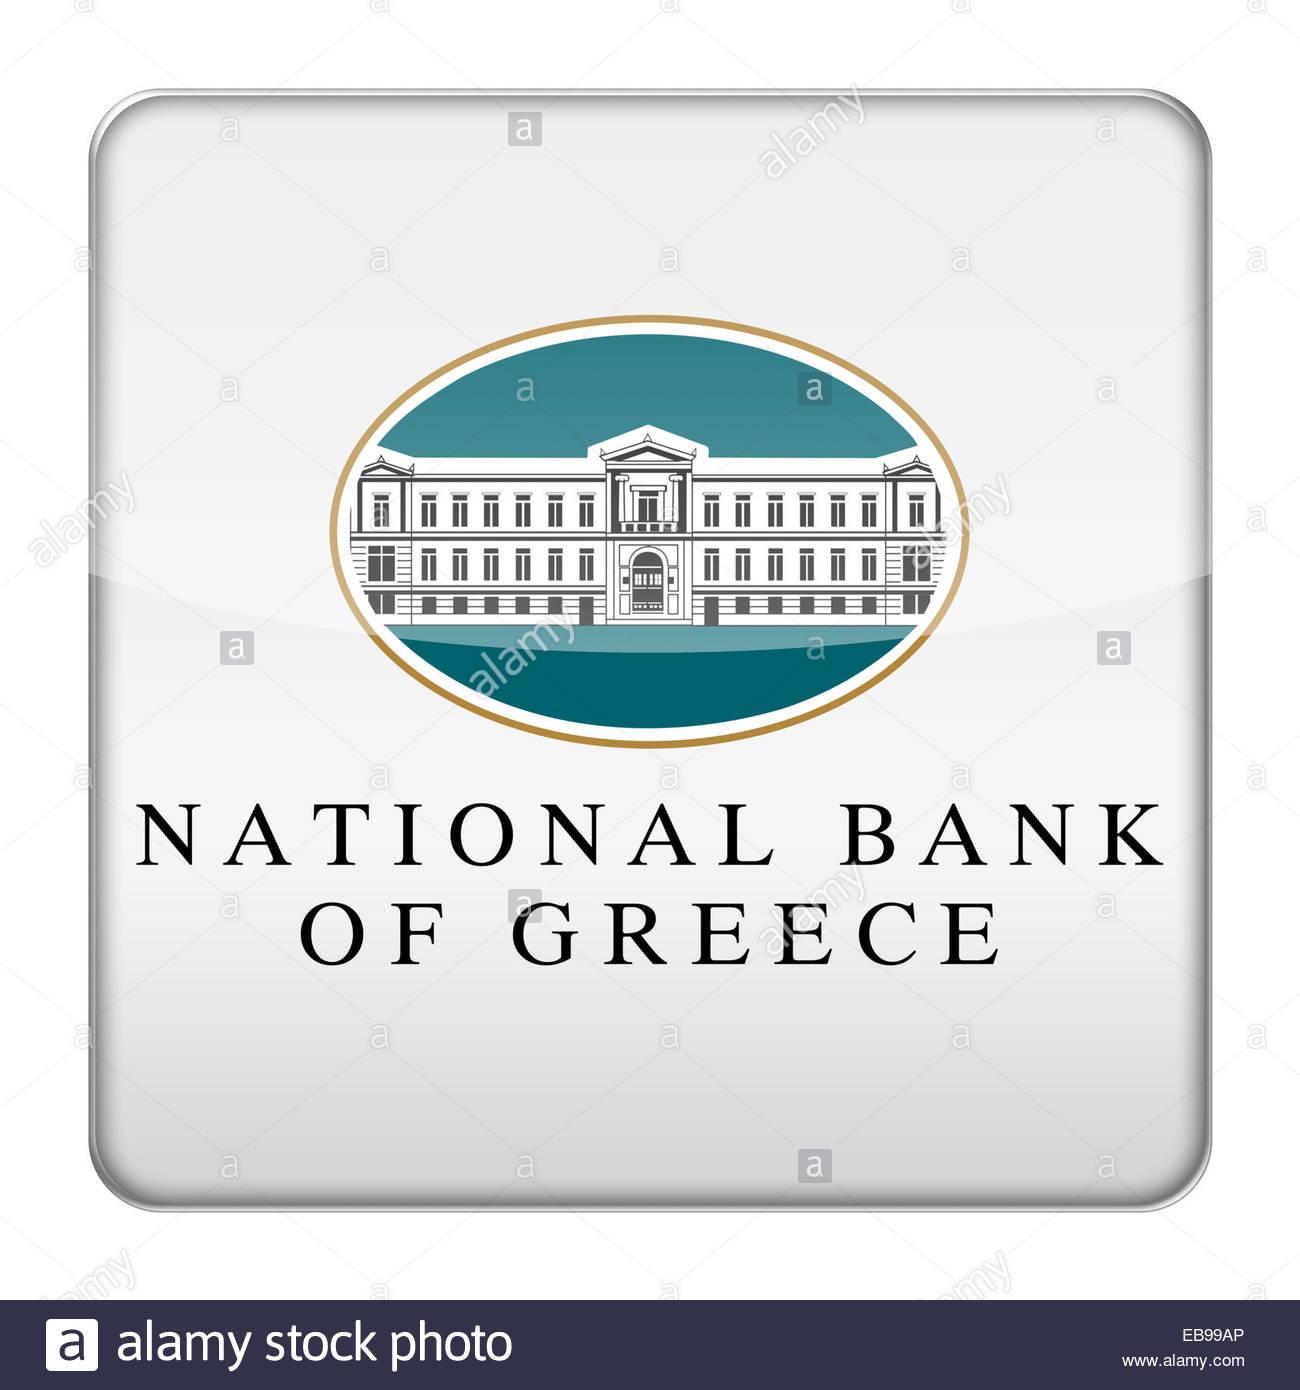 National Bank of Greece logo icon - Stock Image